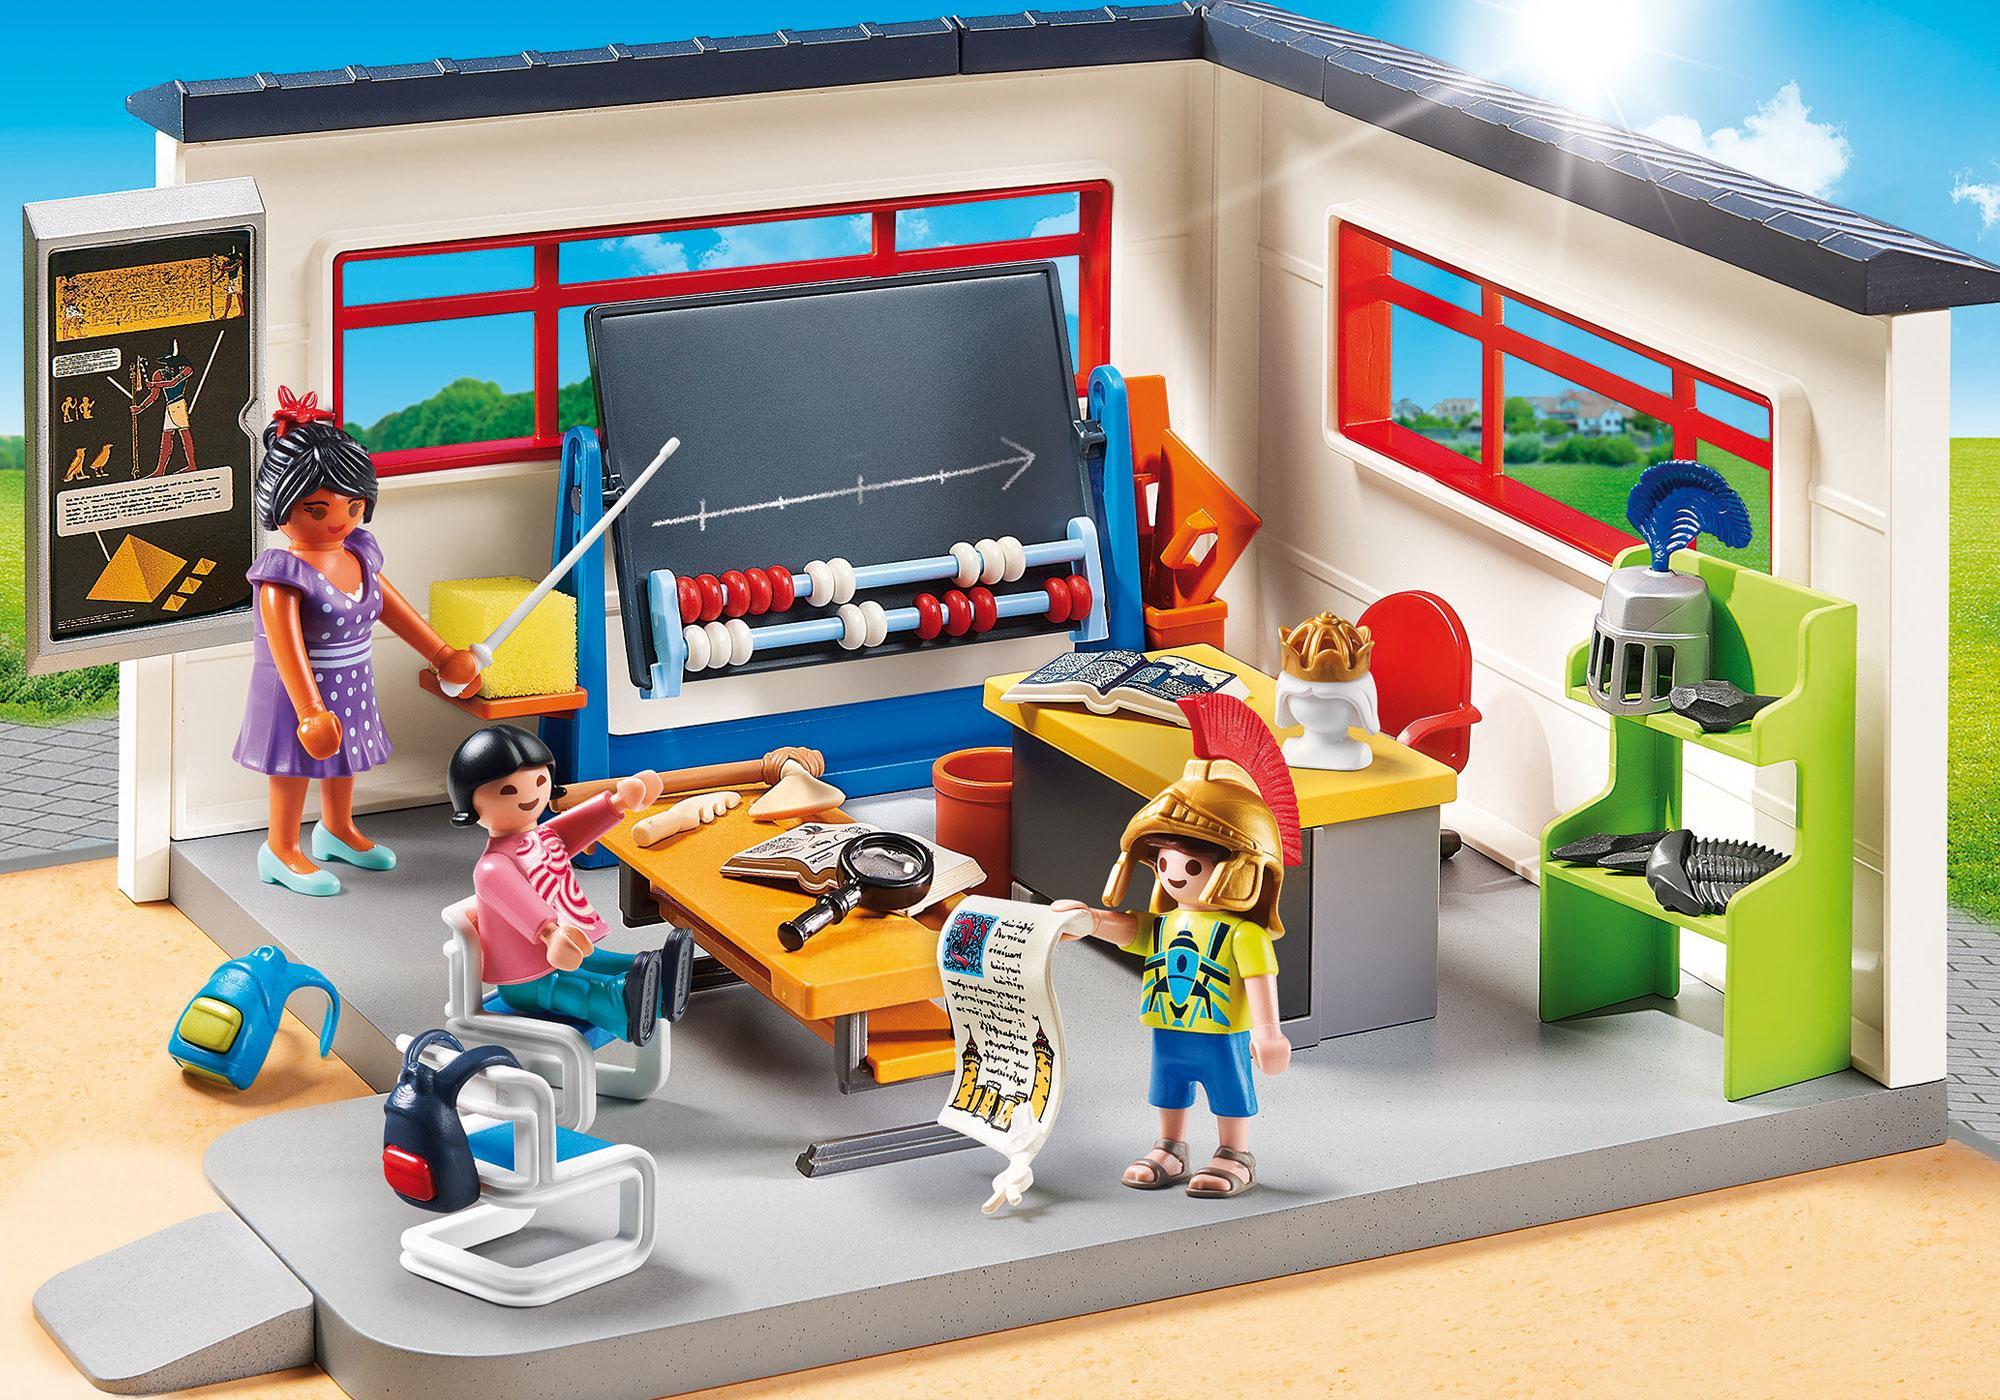 http://media.playmobil.com/i/playmobil/9455_product_detail/Klassenzimmer Geschichtsunterricht